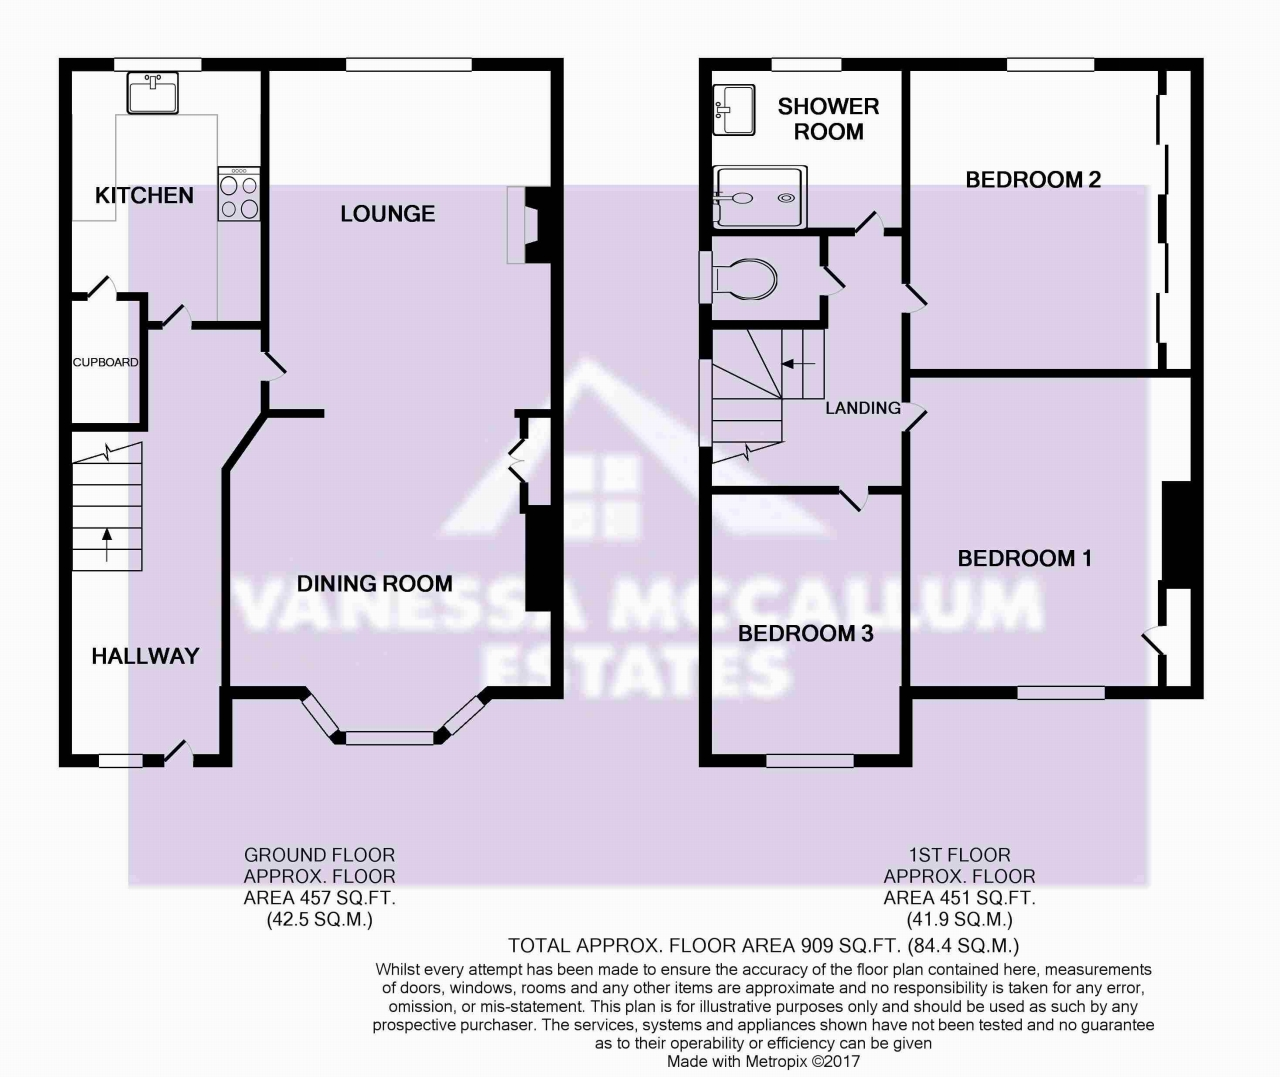 3 Bedrooms Semi-detached house to rent in Quakers Lane, Potters Bar EN6